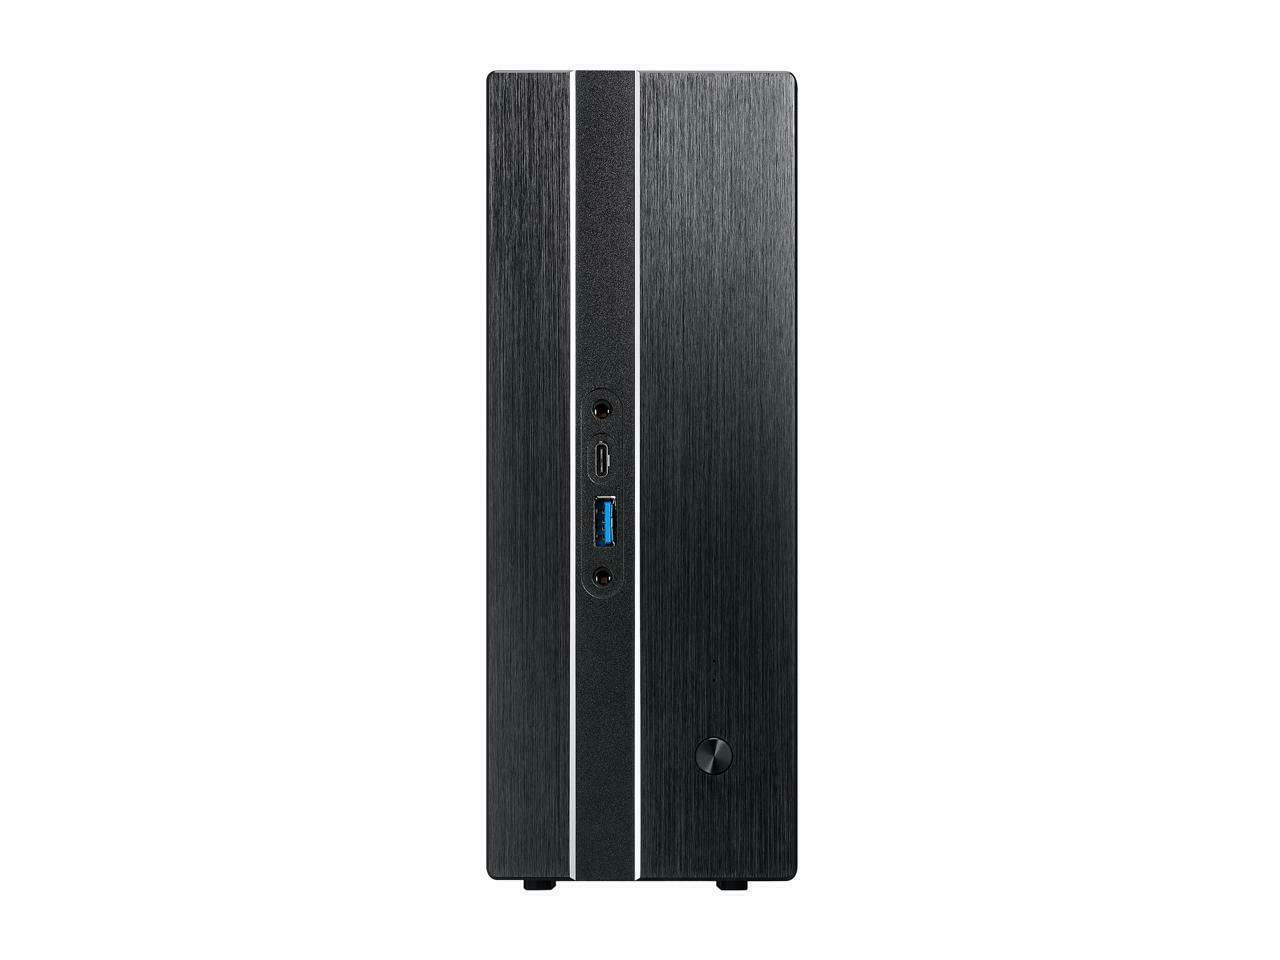 ASRock DESKMINI 6GB Gaming Core i7-7700T, 512GB